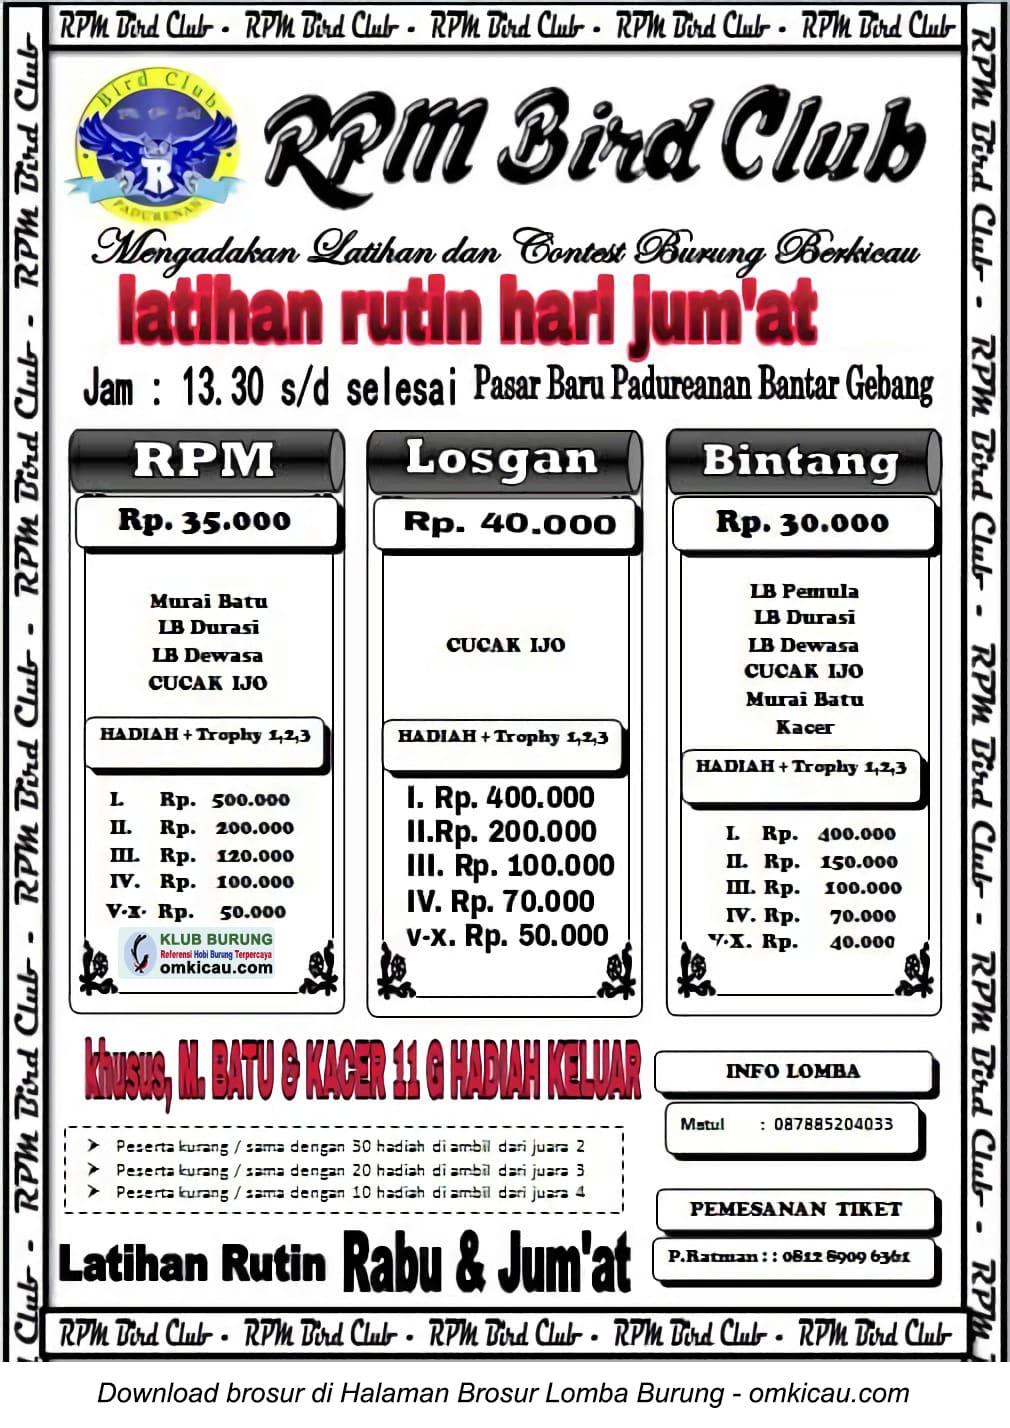 Latber RPM Bird Club Bekasi